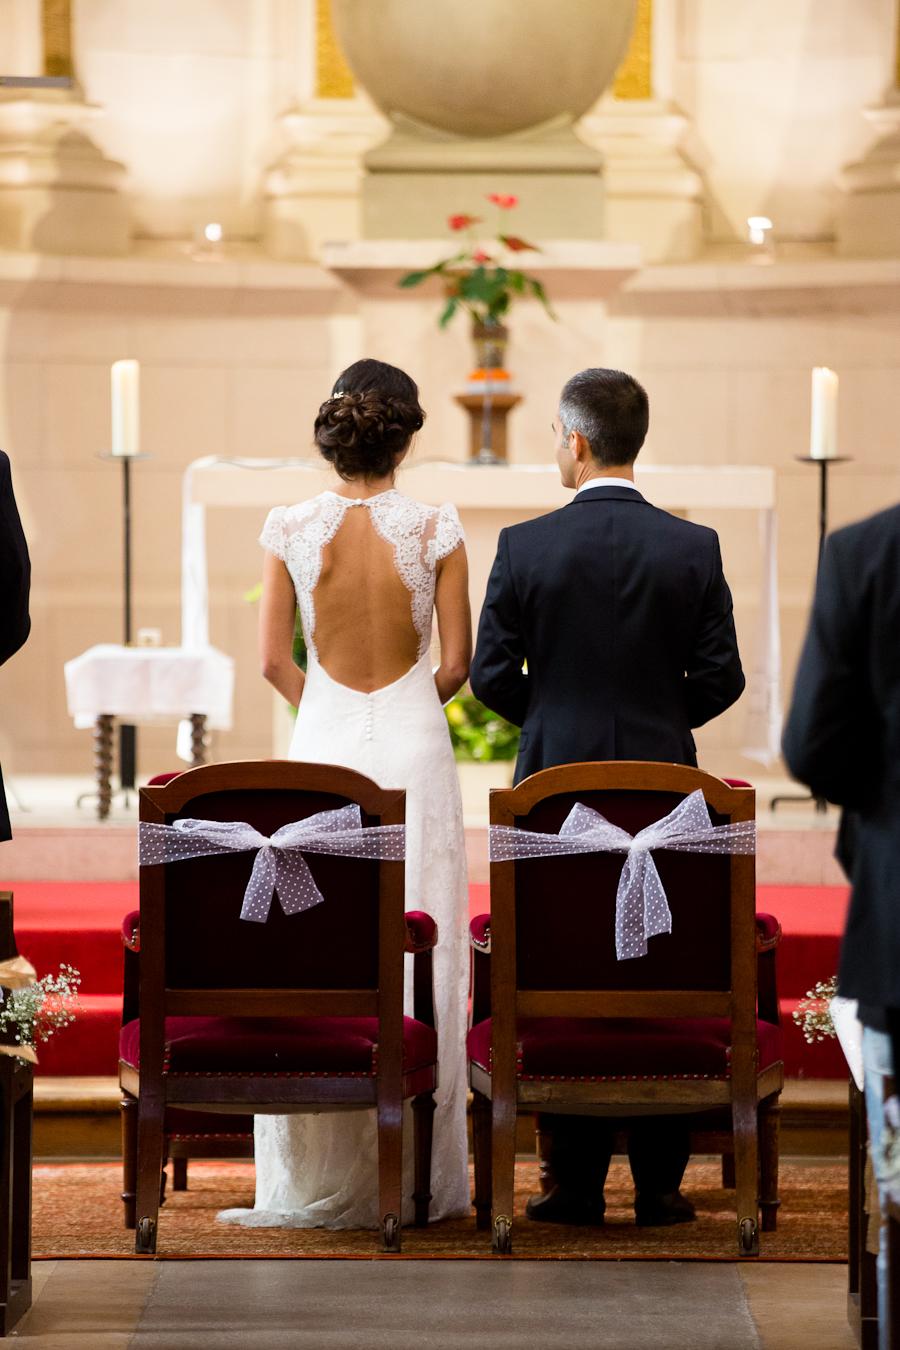 photographe-mariage-keith-flament-grange-de-montmartre-barbery-oise-46